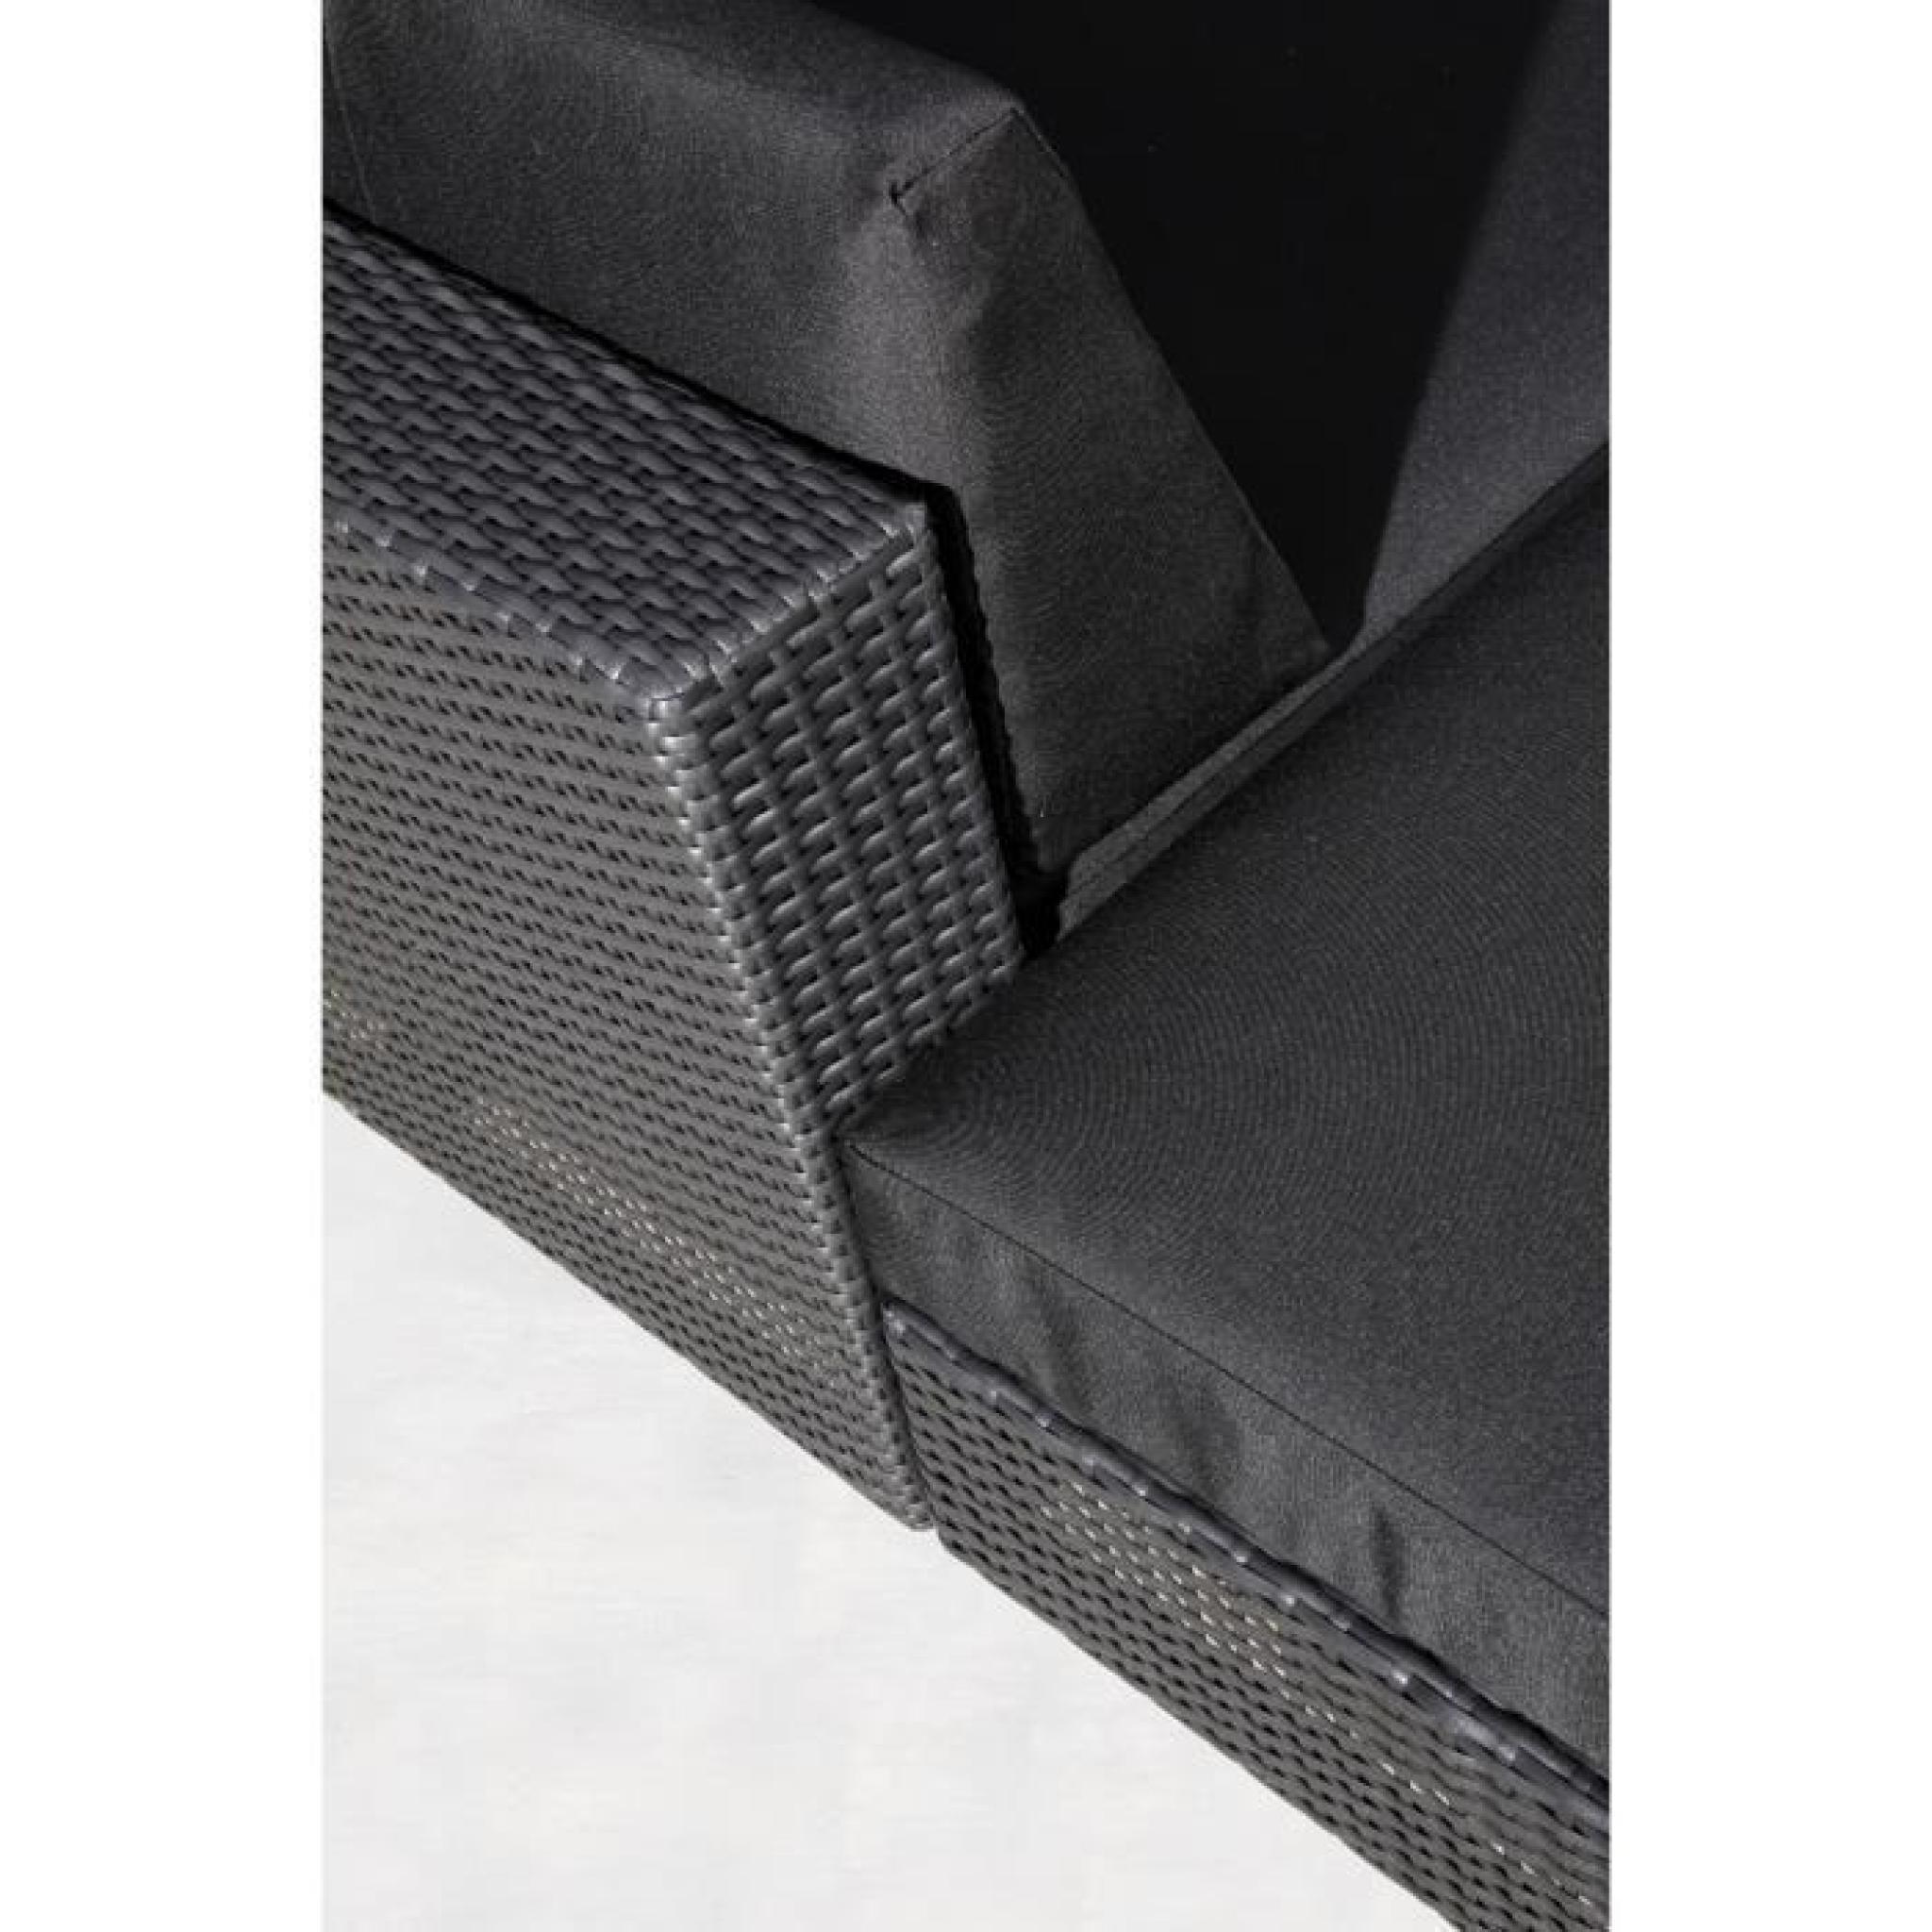 awesome salon de jardin angle noir images amazing house design. Black Bedroom Furniture Sets. Home Design Ideas